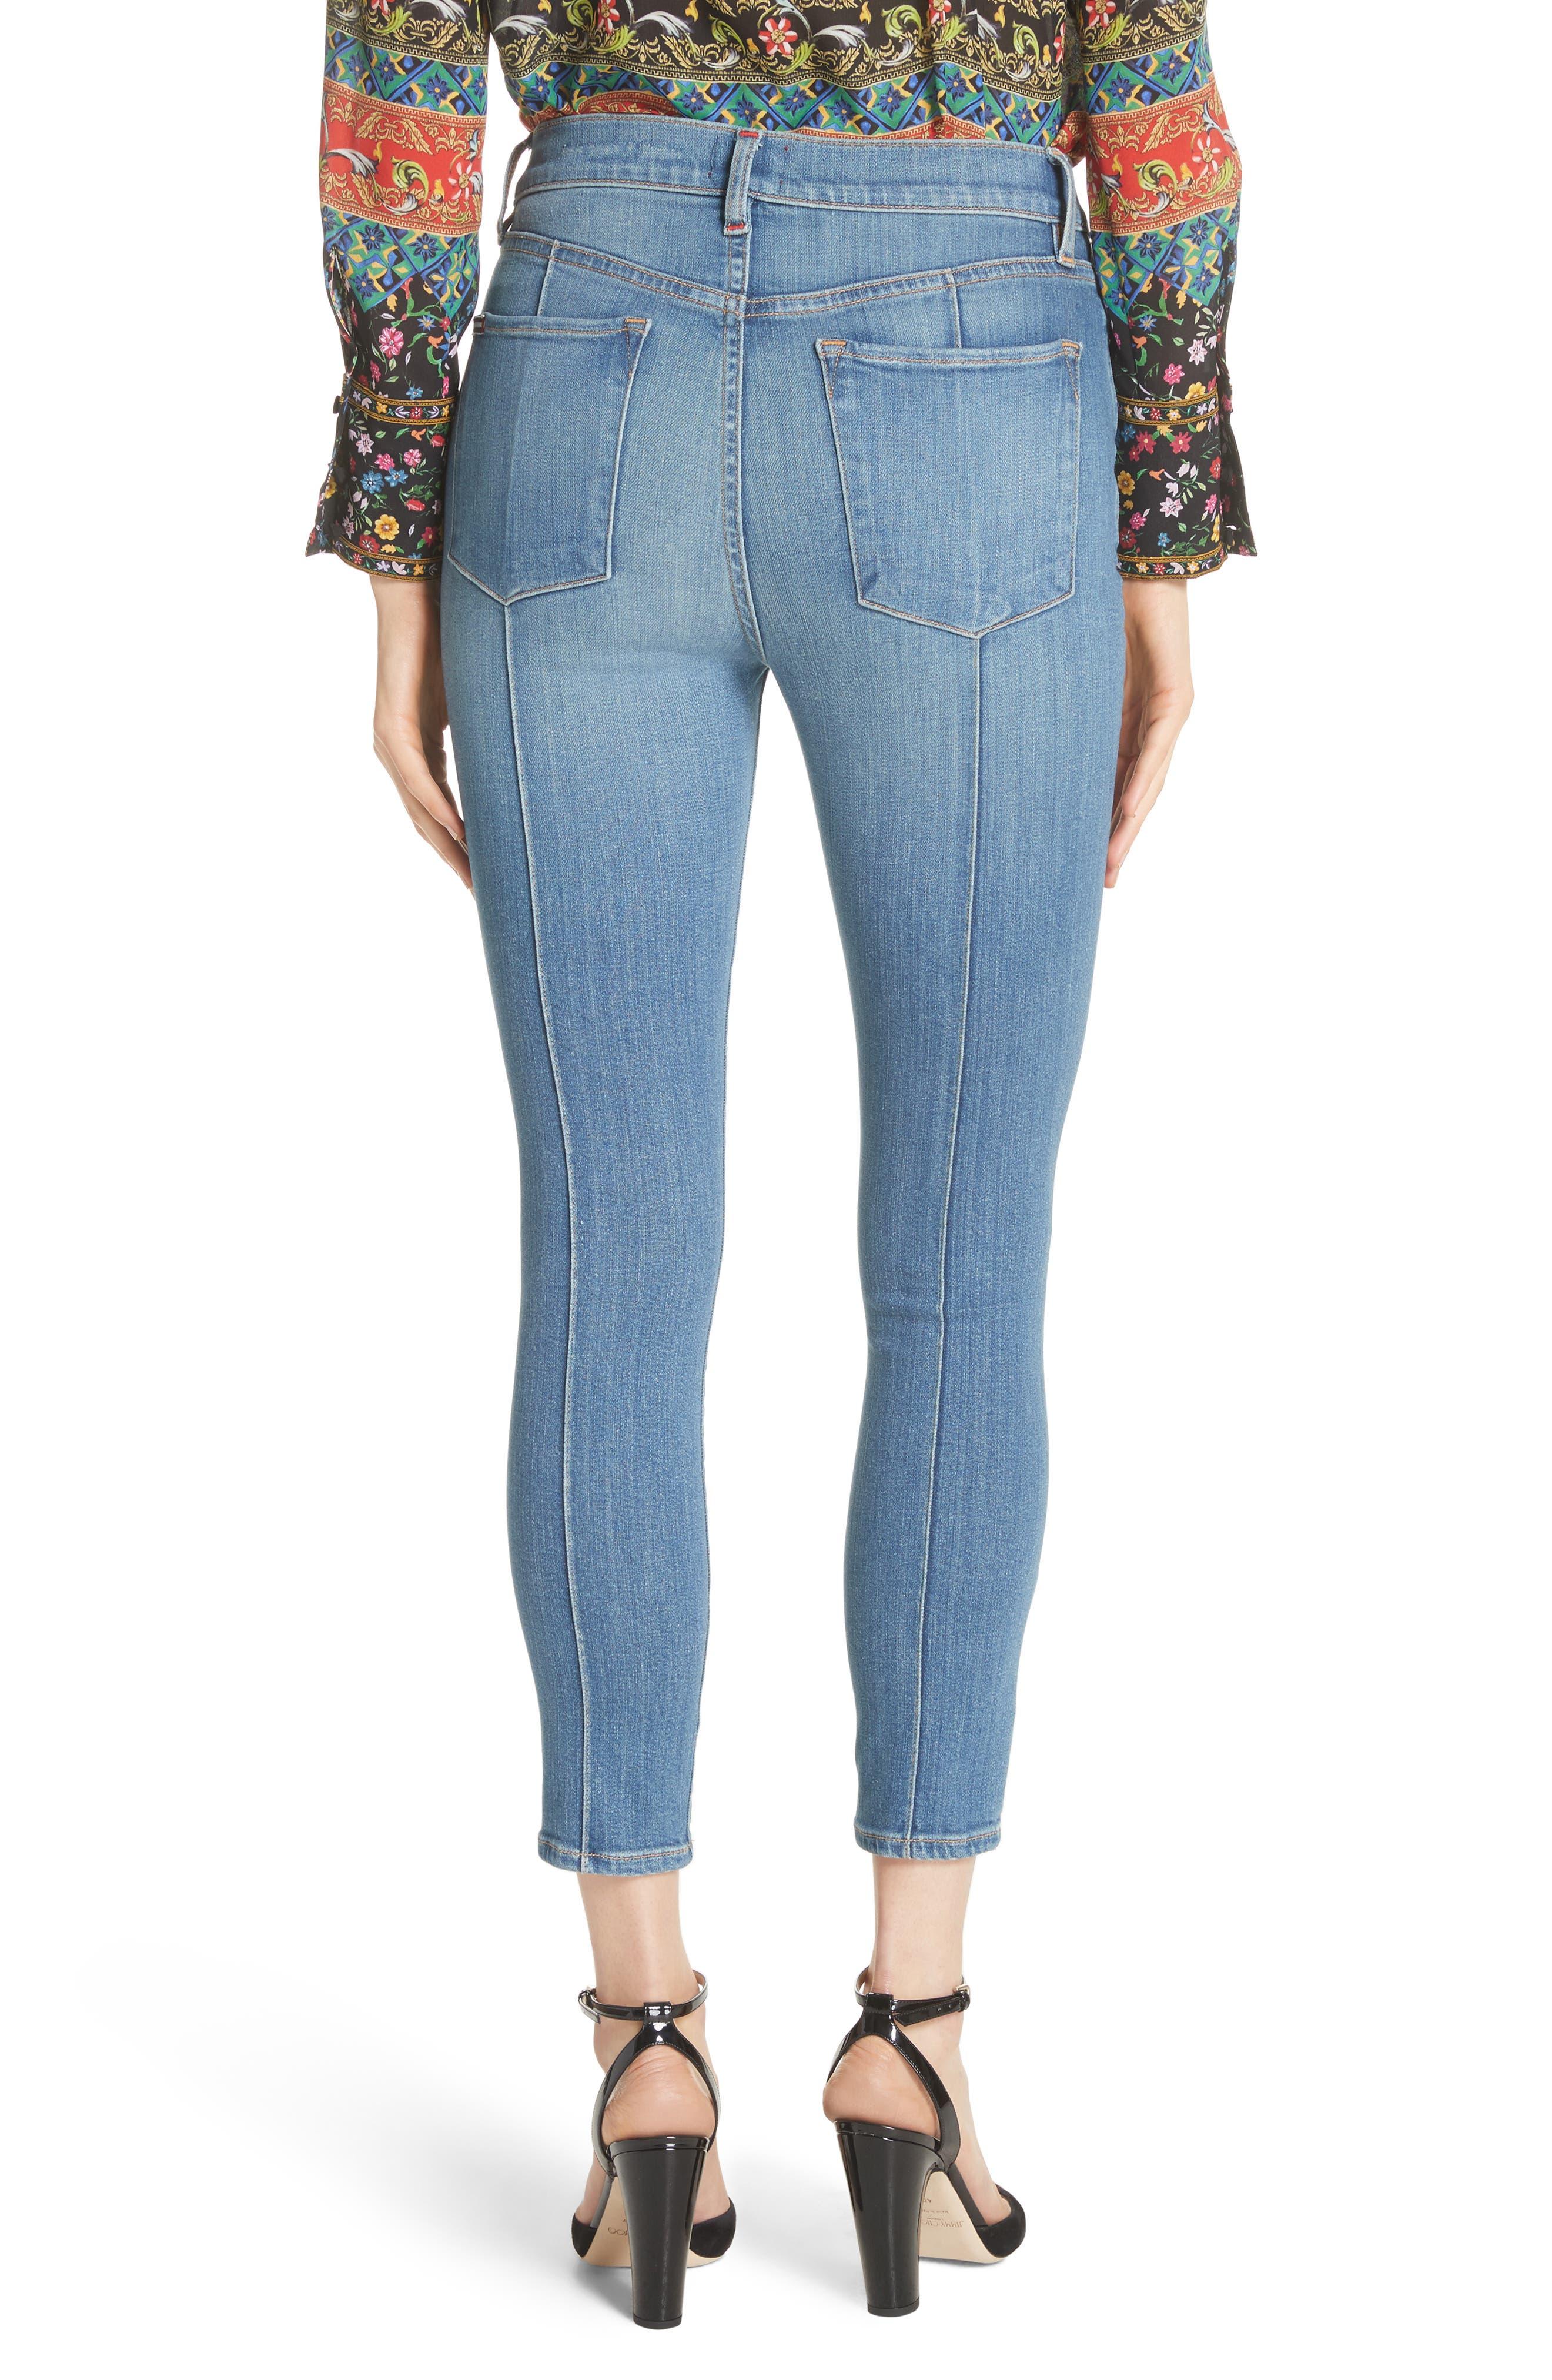 AO.LA Good High Waist Pintuck Skinny Jeans,                             Alternate thumbnail 2, color,                             Roadhouse Blues